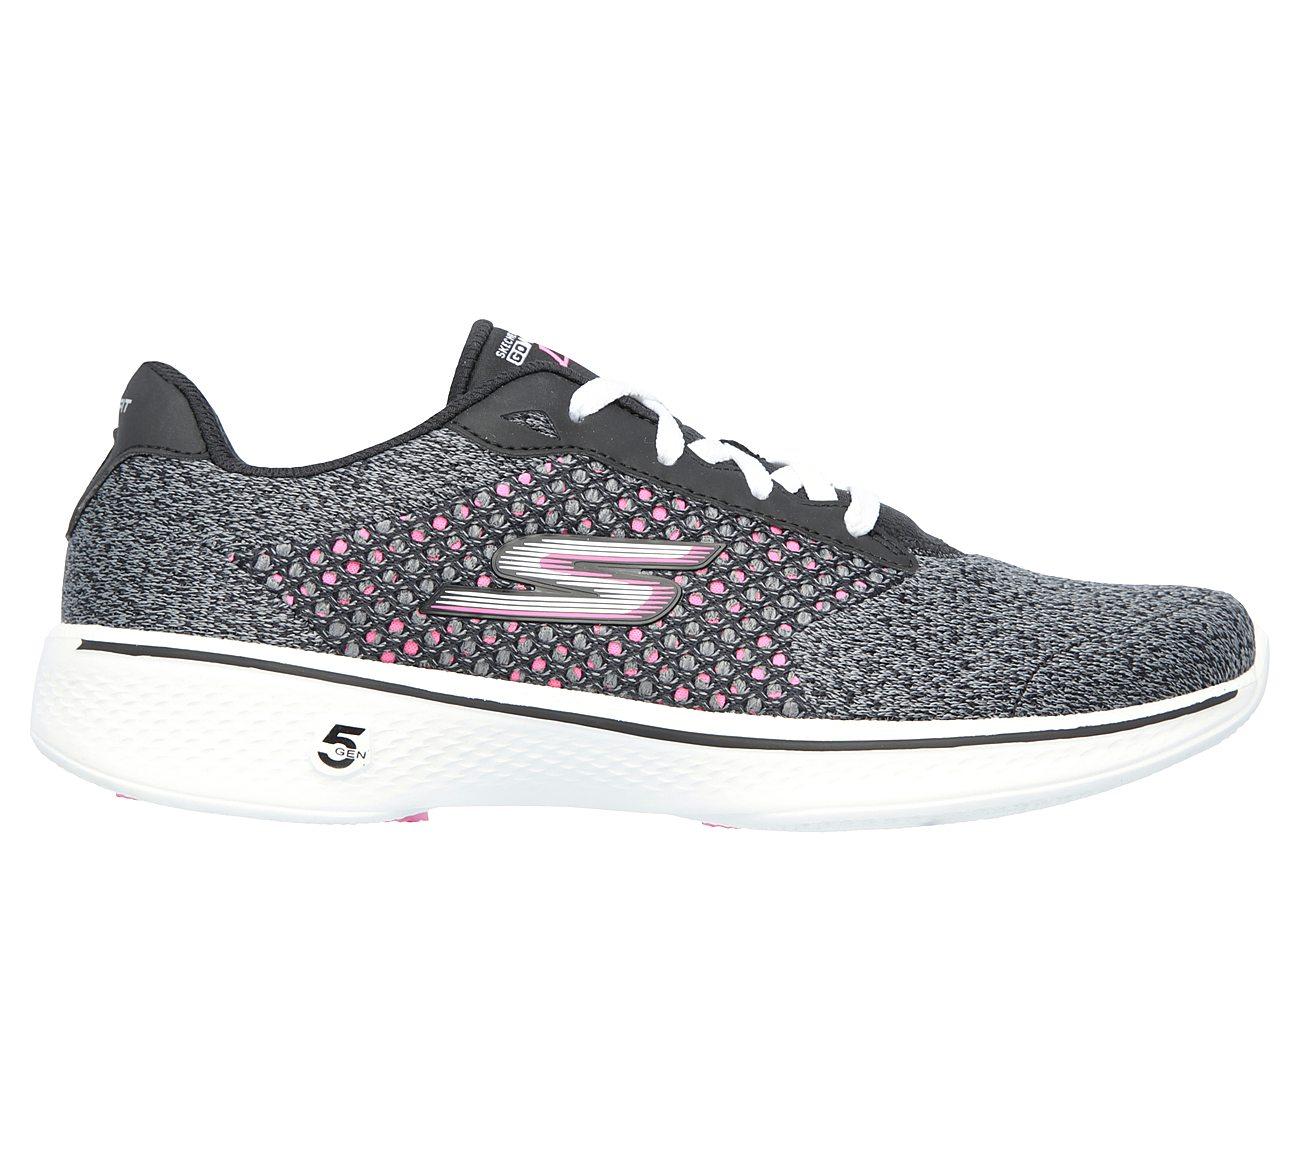 66d456832f86 Buy SKECHERS Skechers GOwalk 4 - Exceed Skechers Performance Shoes only   75.00